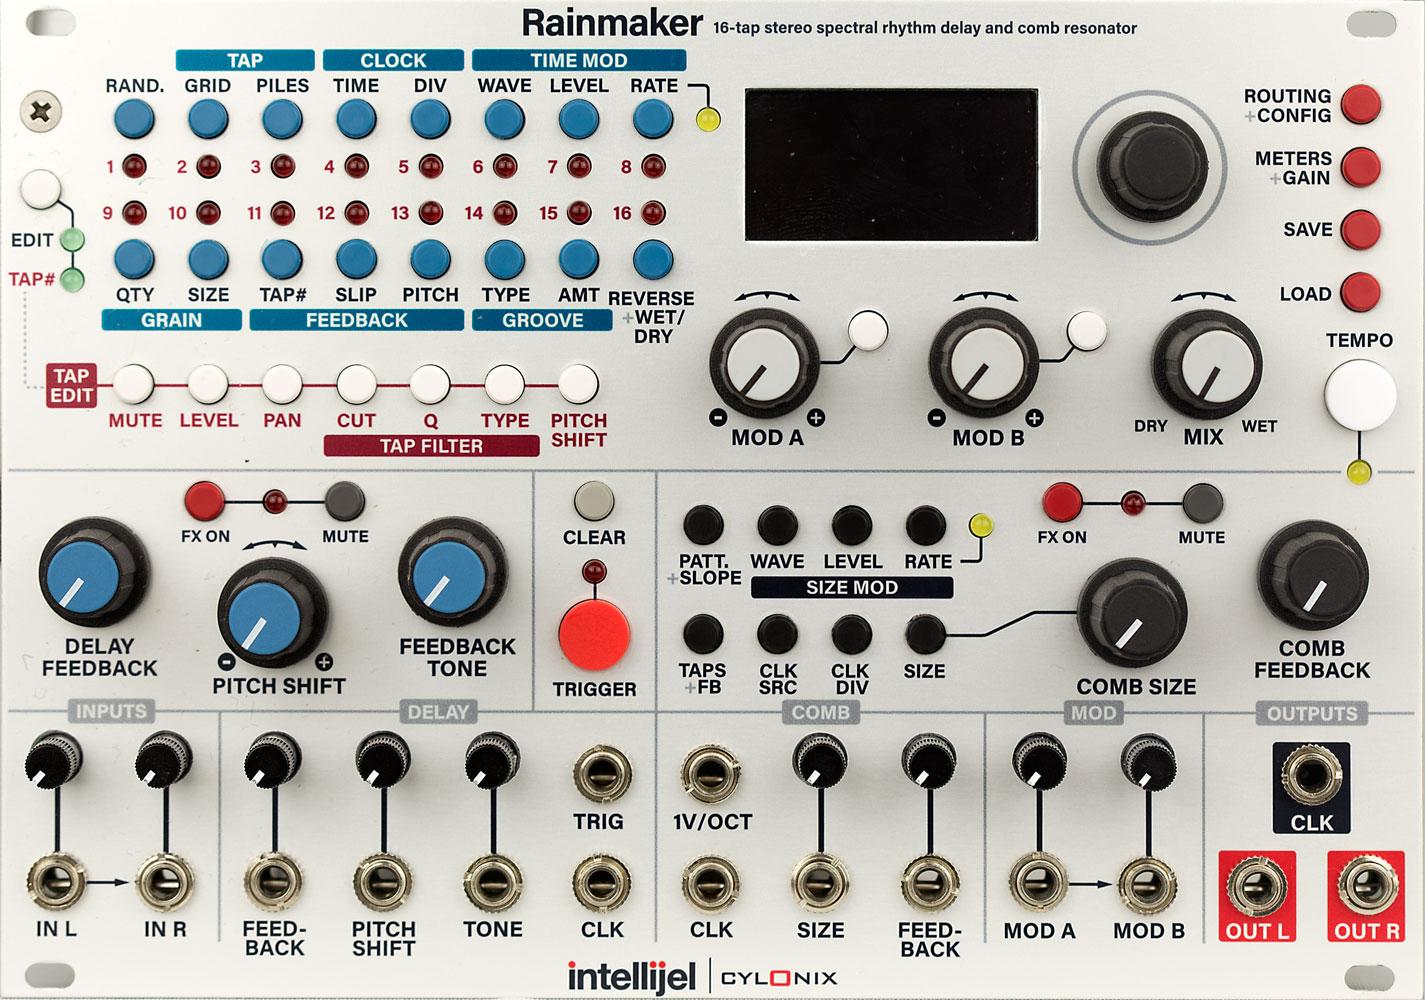 Cylonix Rainmaker